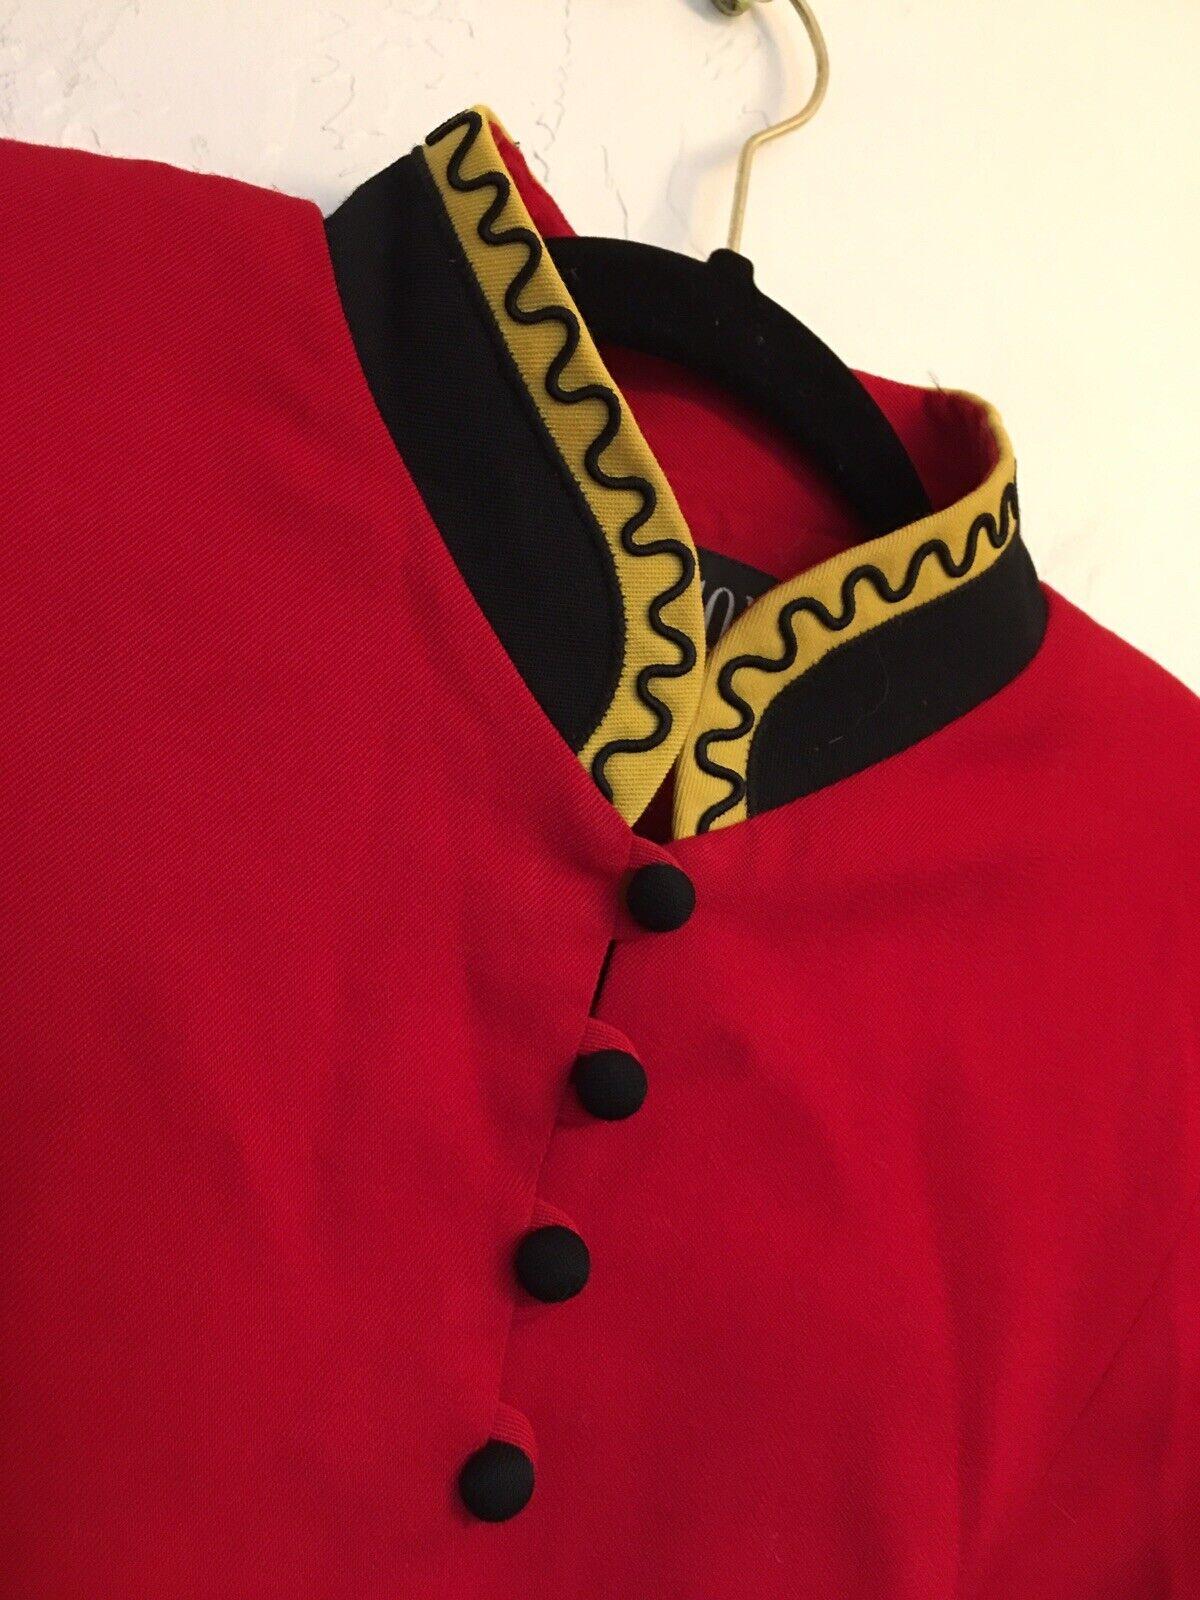 Hairson Roberson Wool Western Jacket Sz 4 Ringmaster Red Yellow Coat